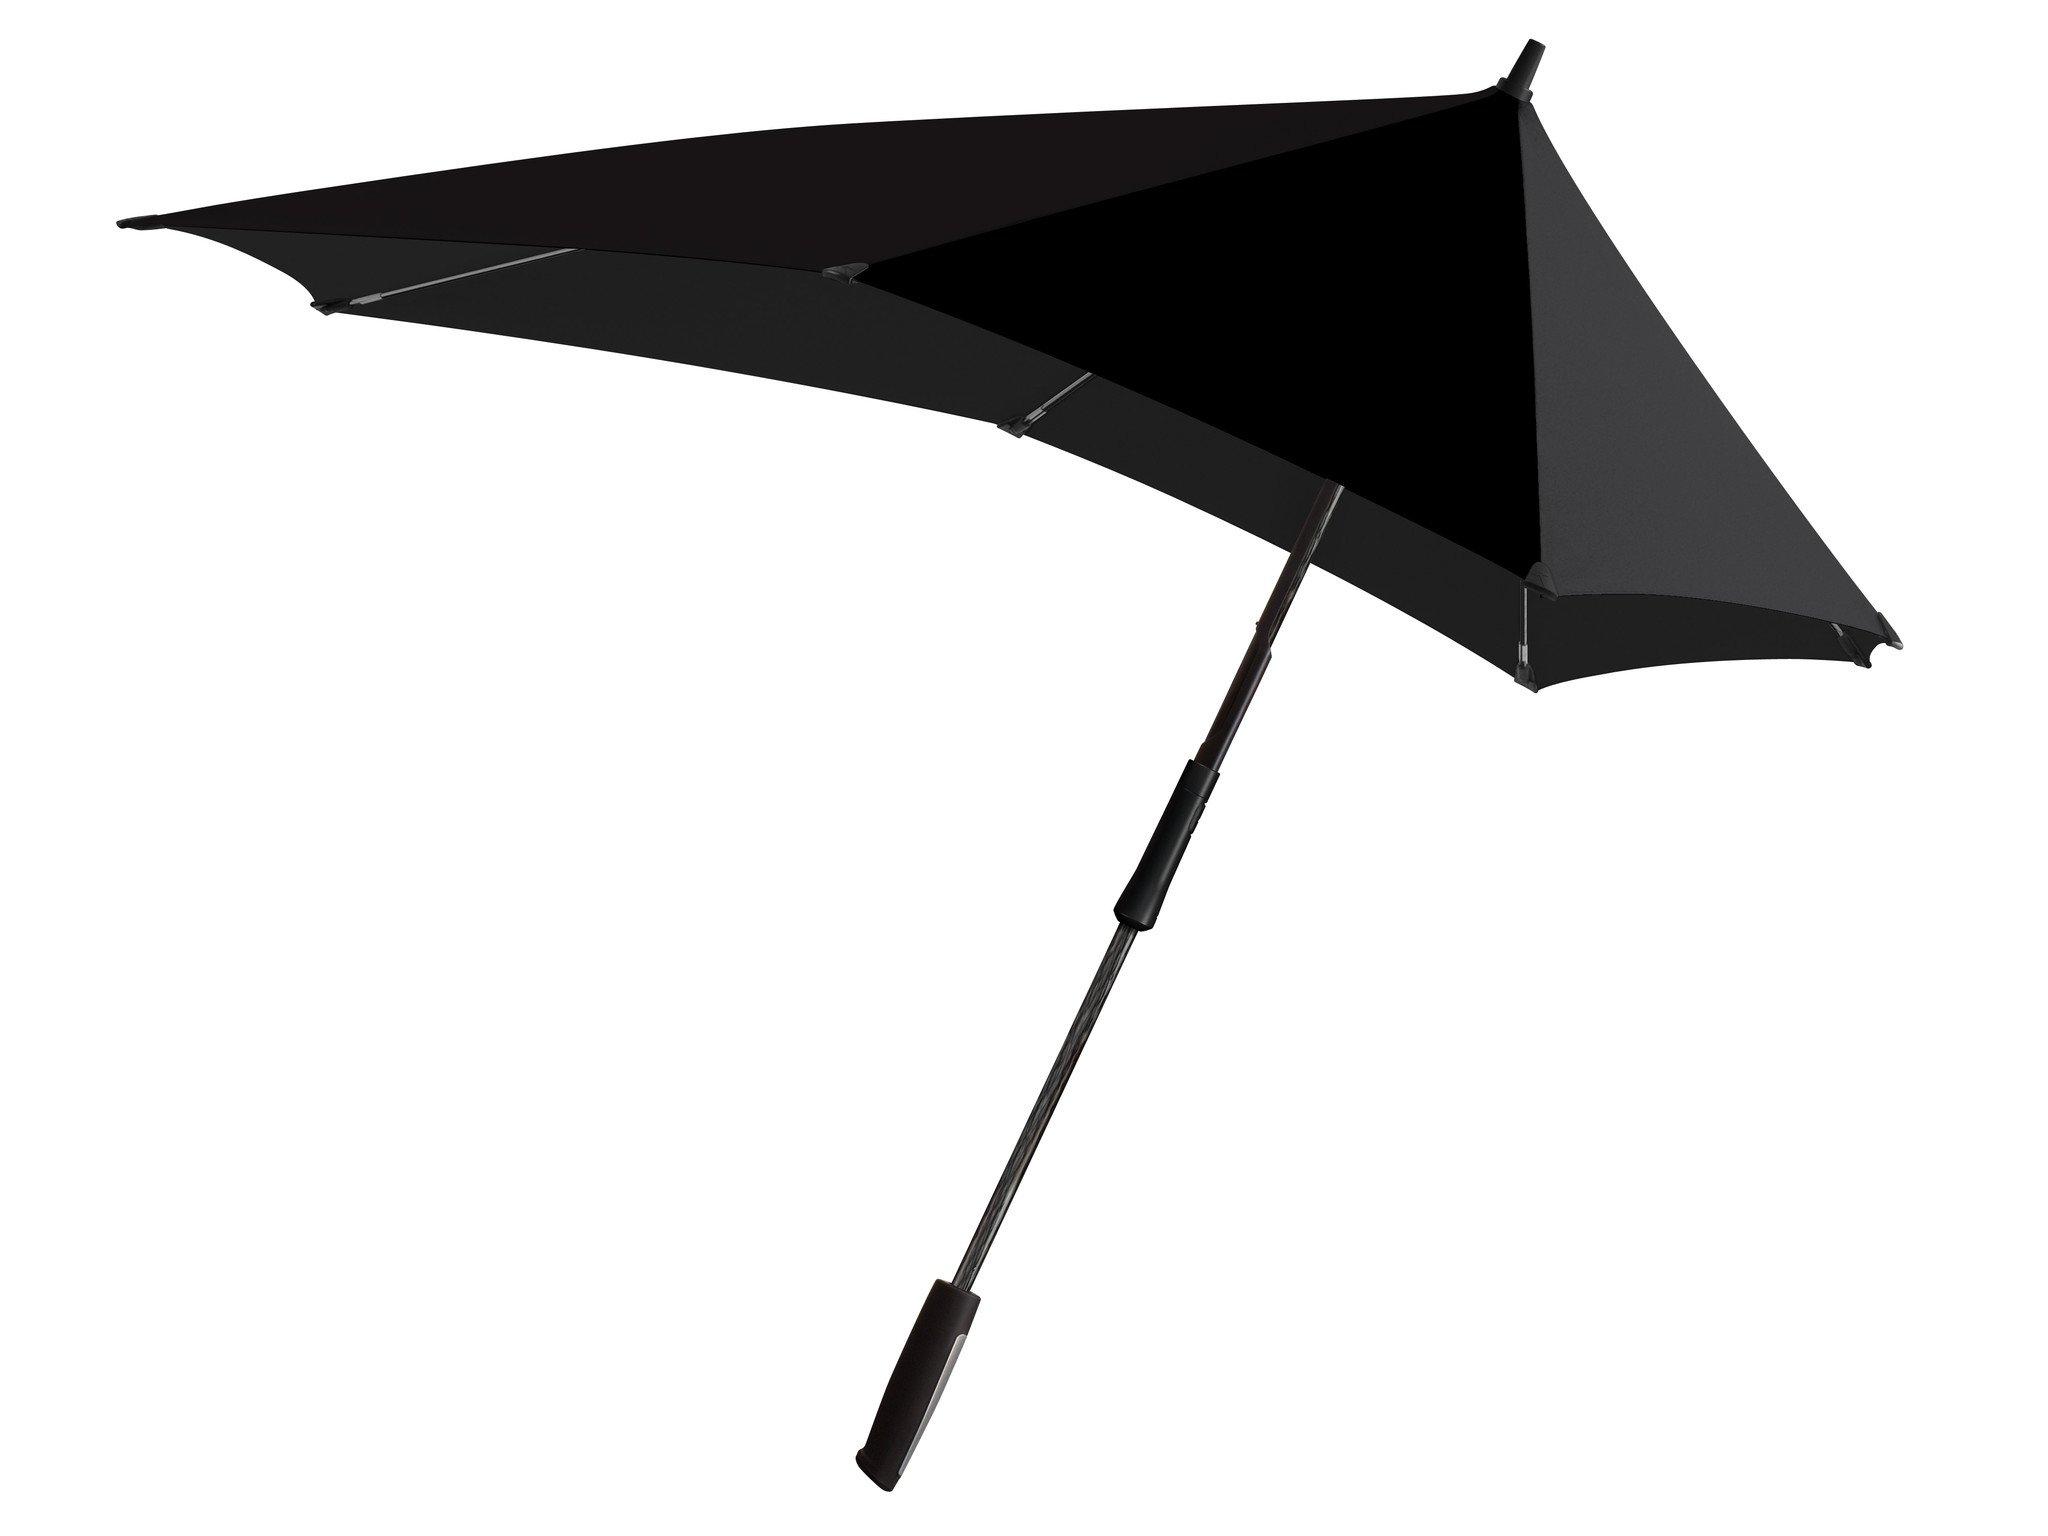 Senz Umbrellas XXL, Pure Black, One Size